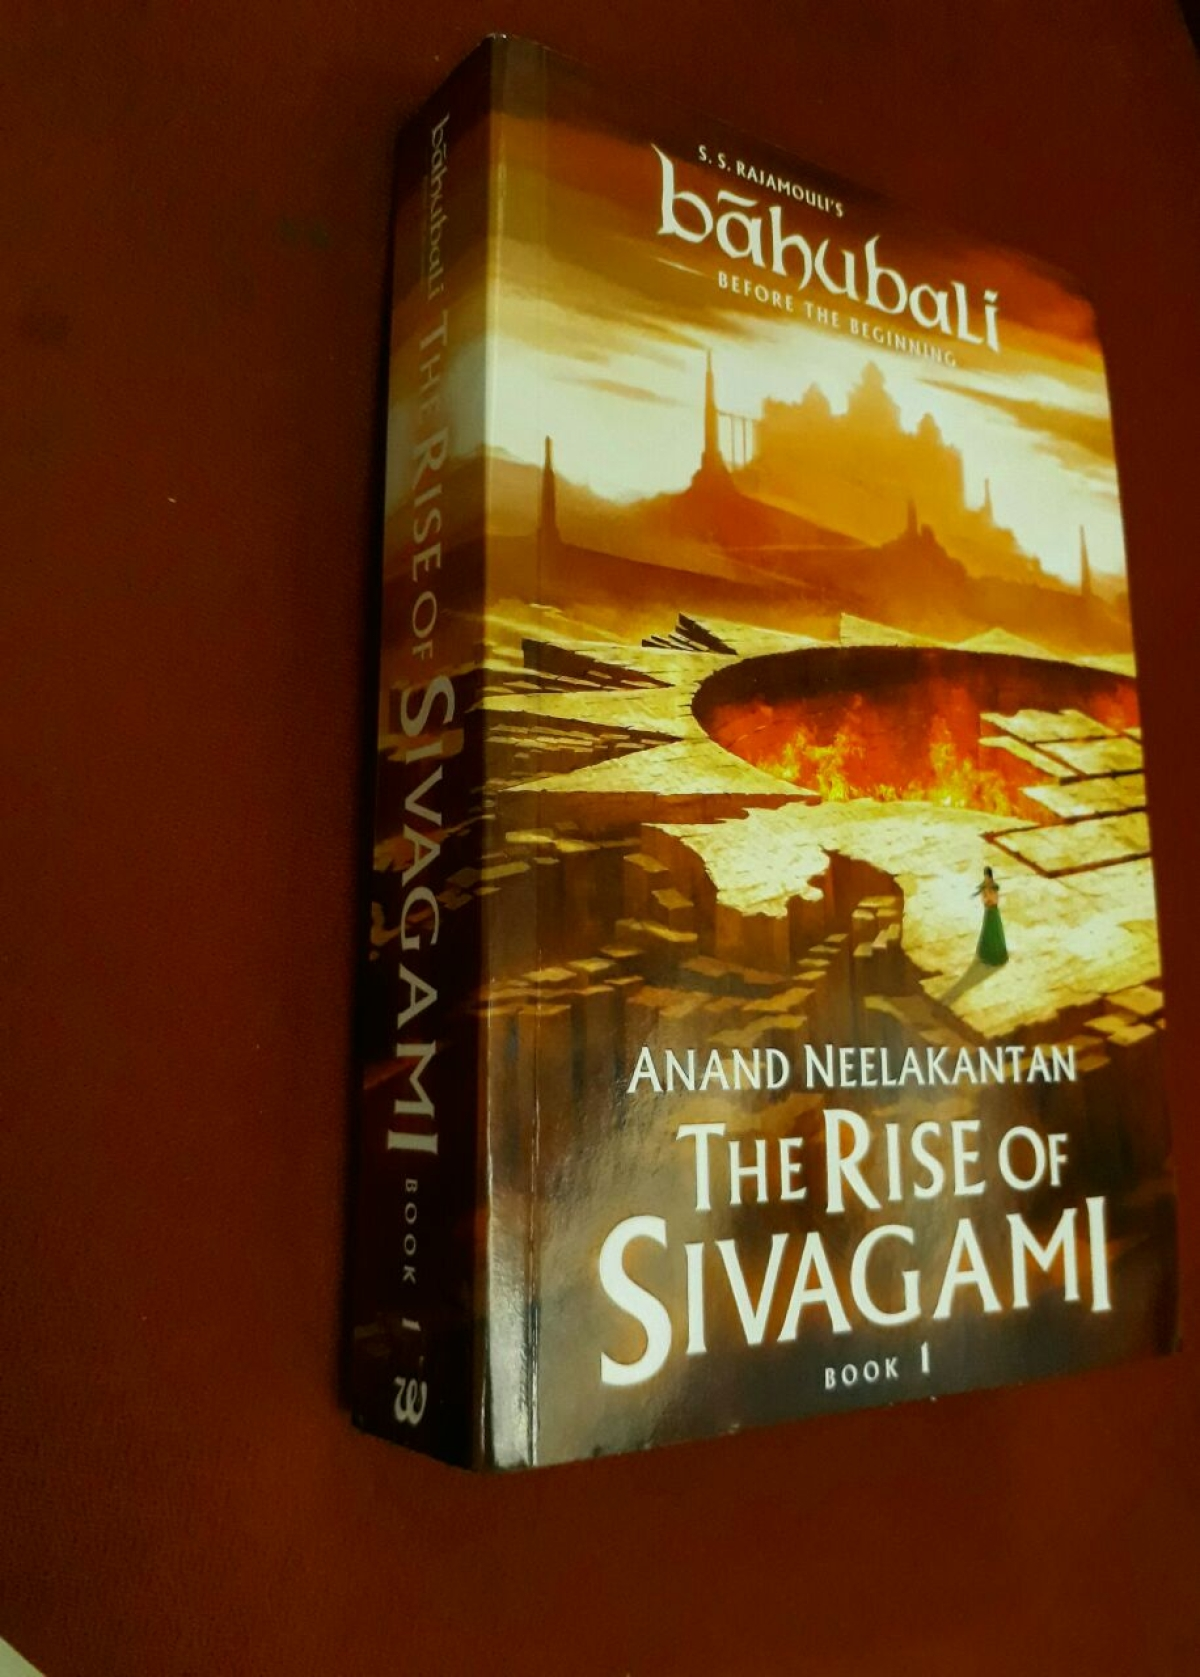 Why Did Katappa Kill Baahubali? The Book Finally Spills the Beans